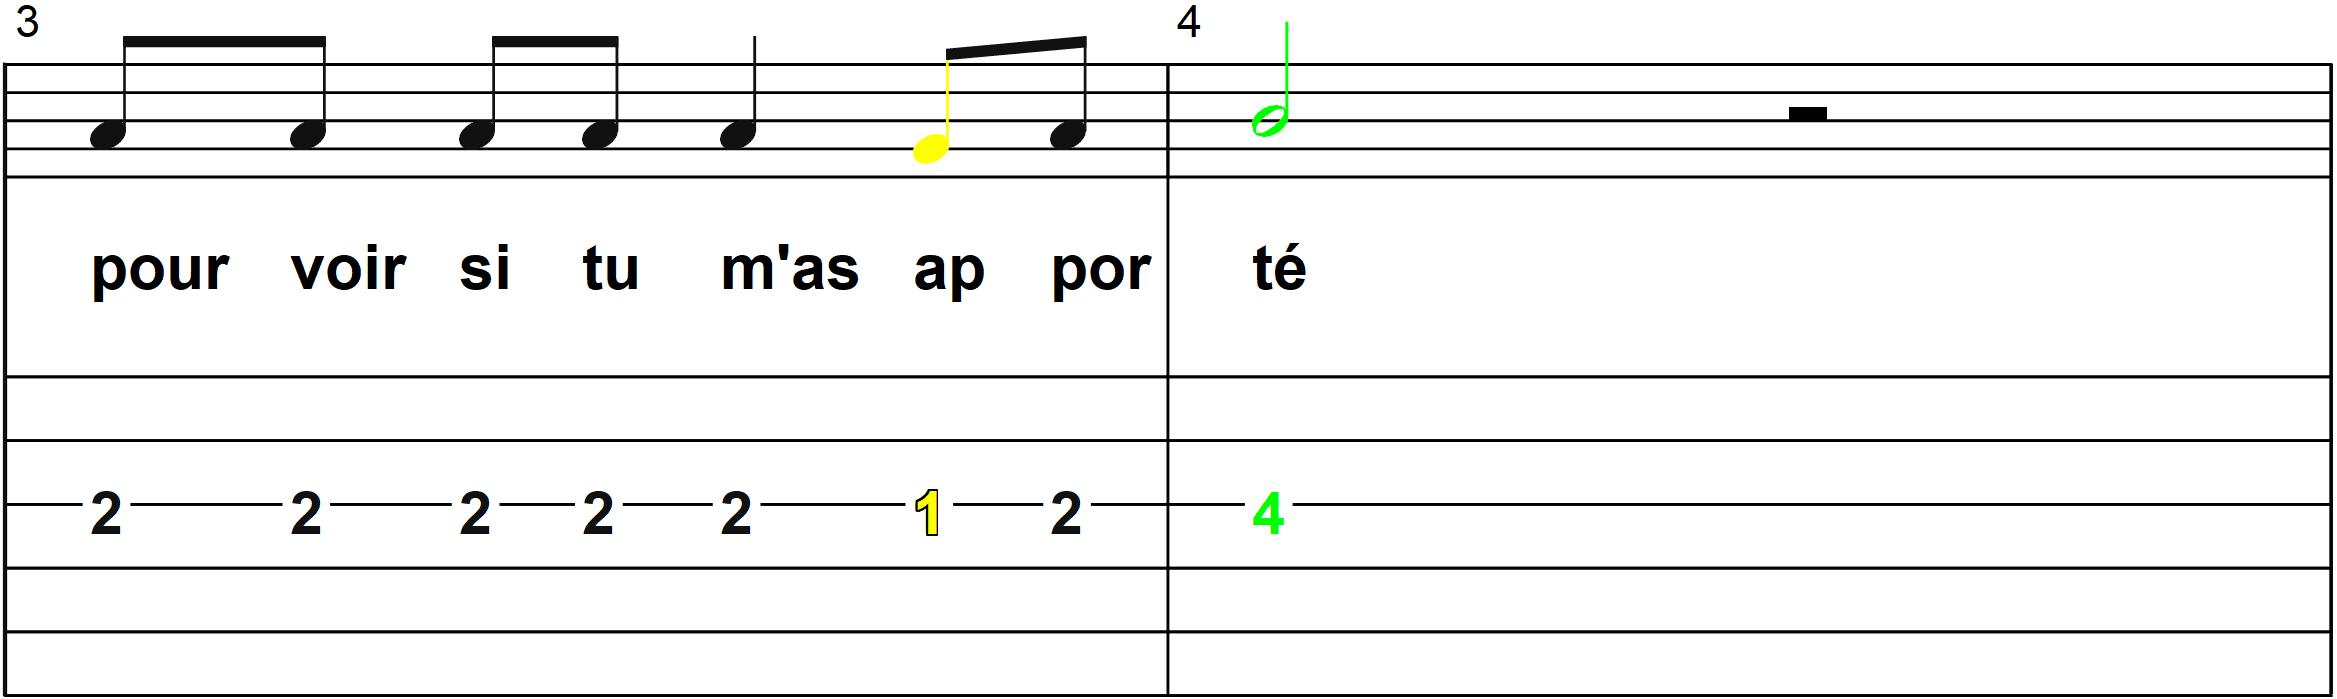 Petit Papa Noel - Mélodie du couplet B - Page 2